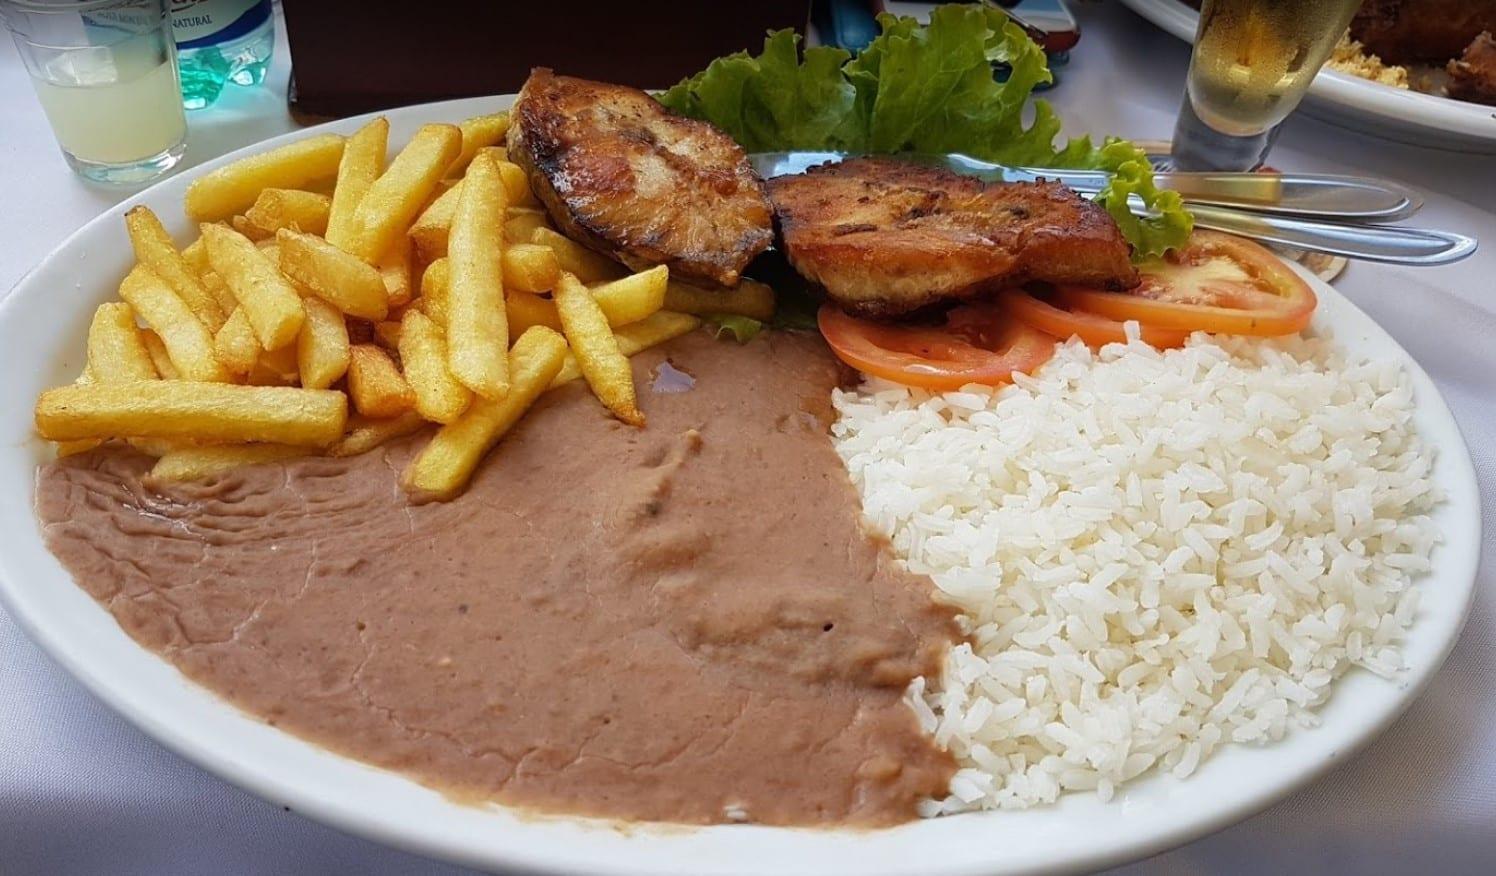 almoçar em Brasília_almoço